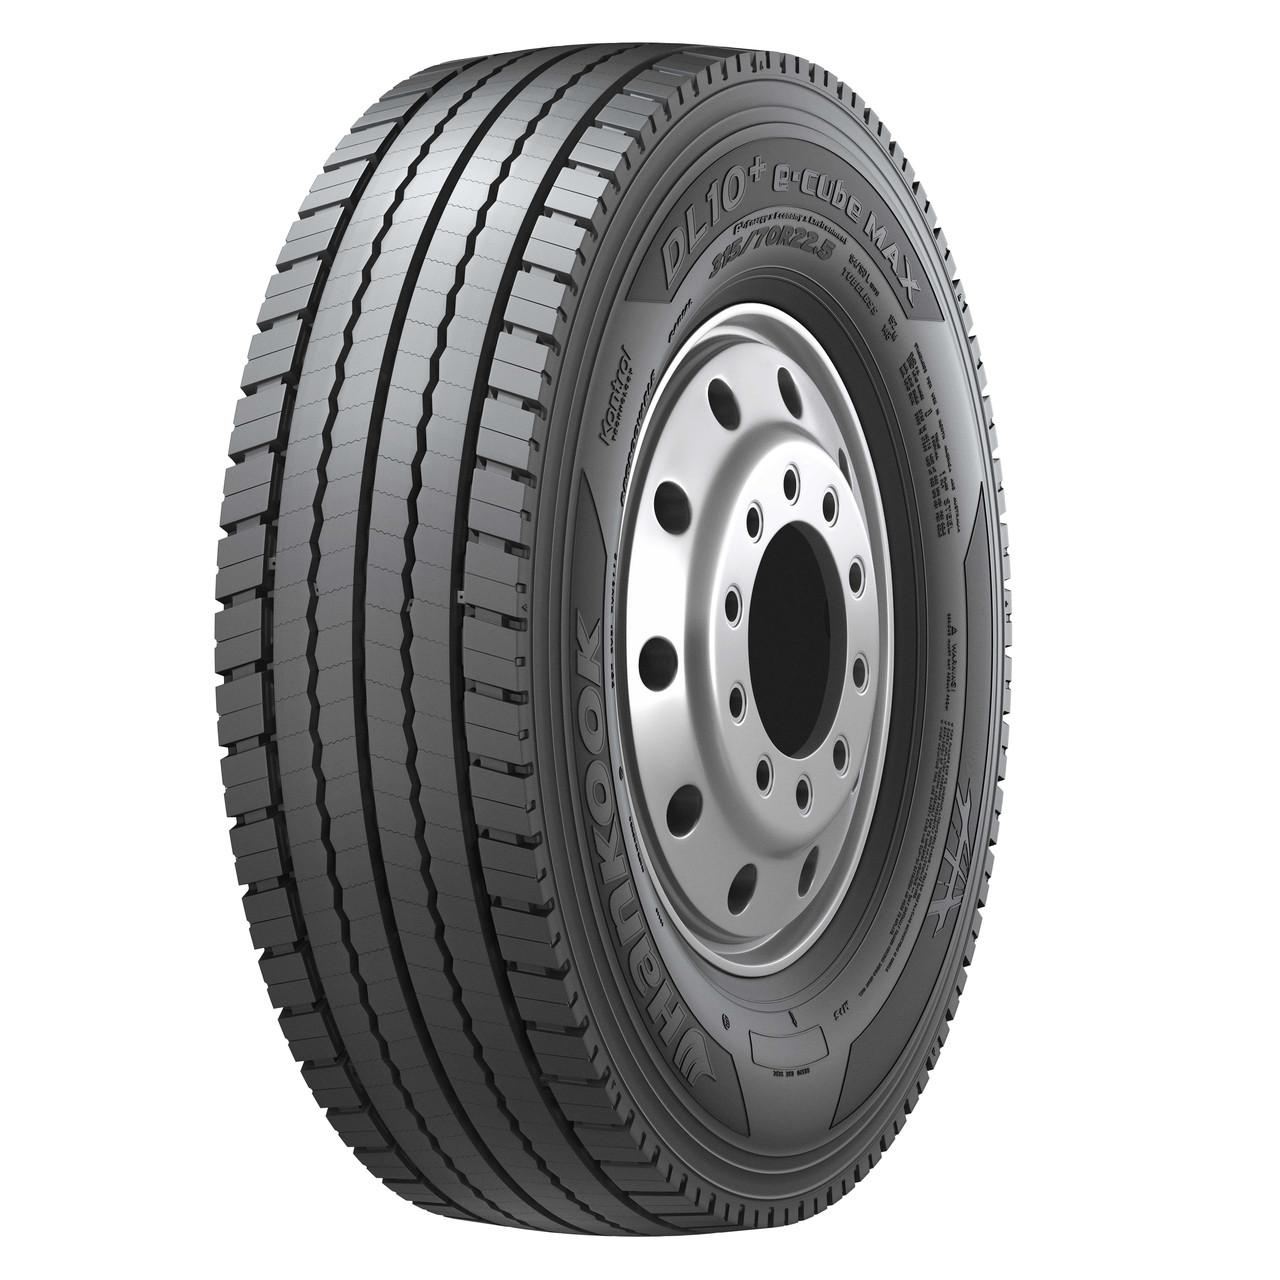 Грузоввые шины Hankook DL 10 E-Cub, 315 60 R22.5